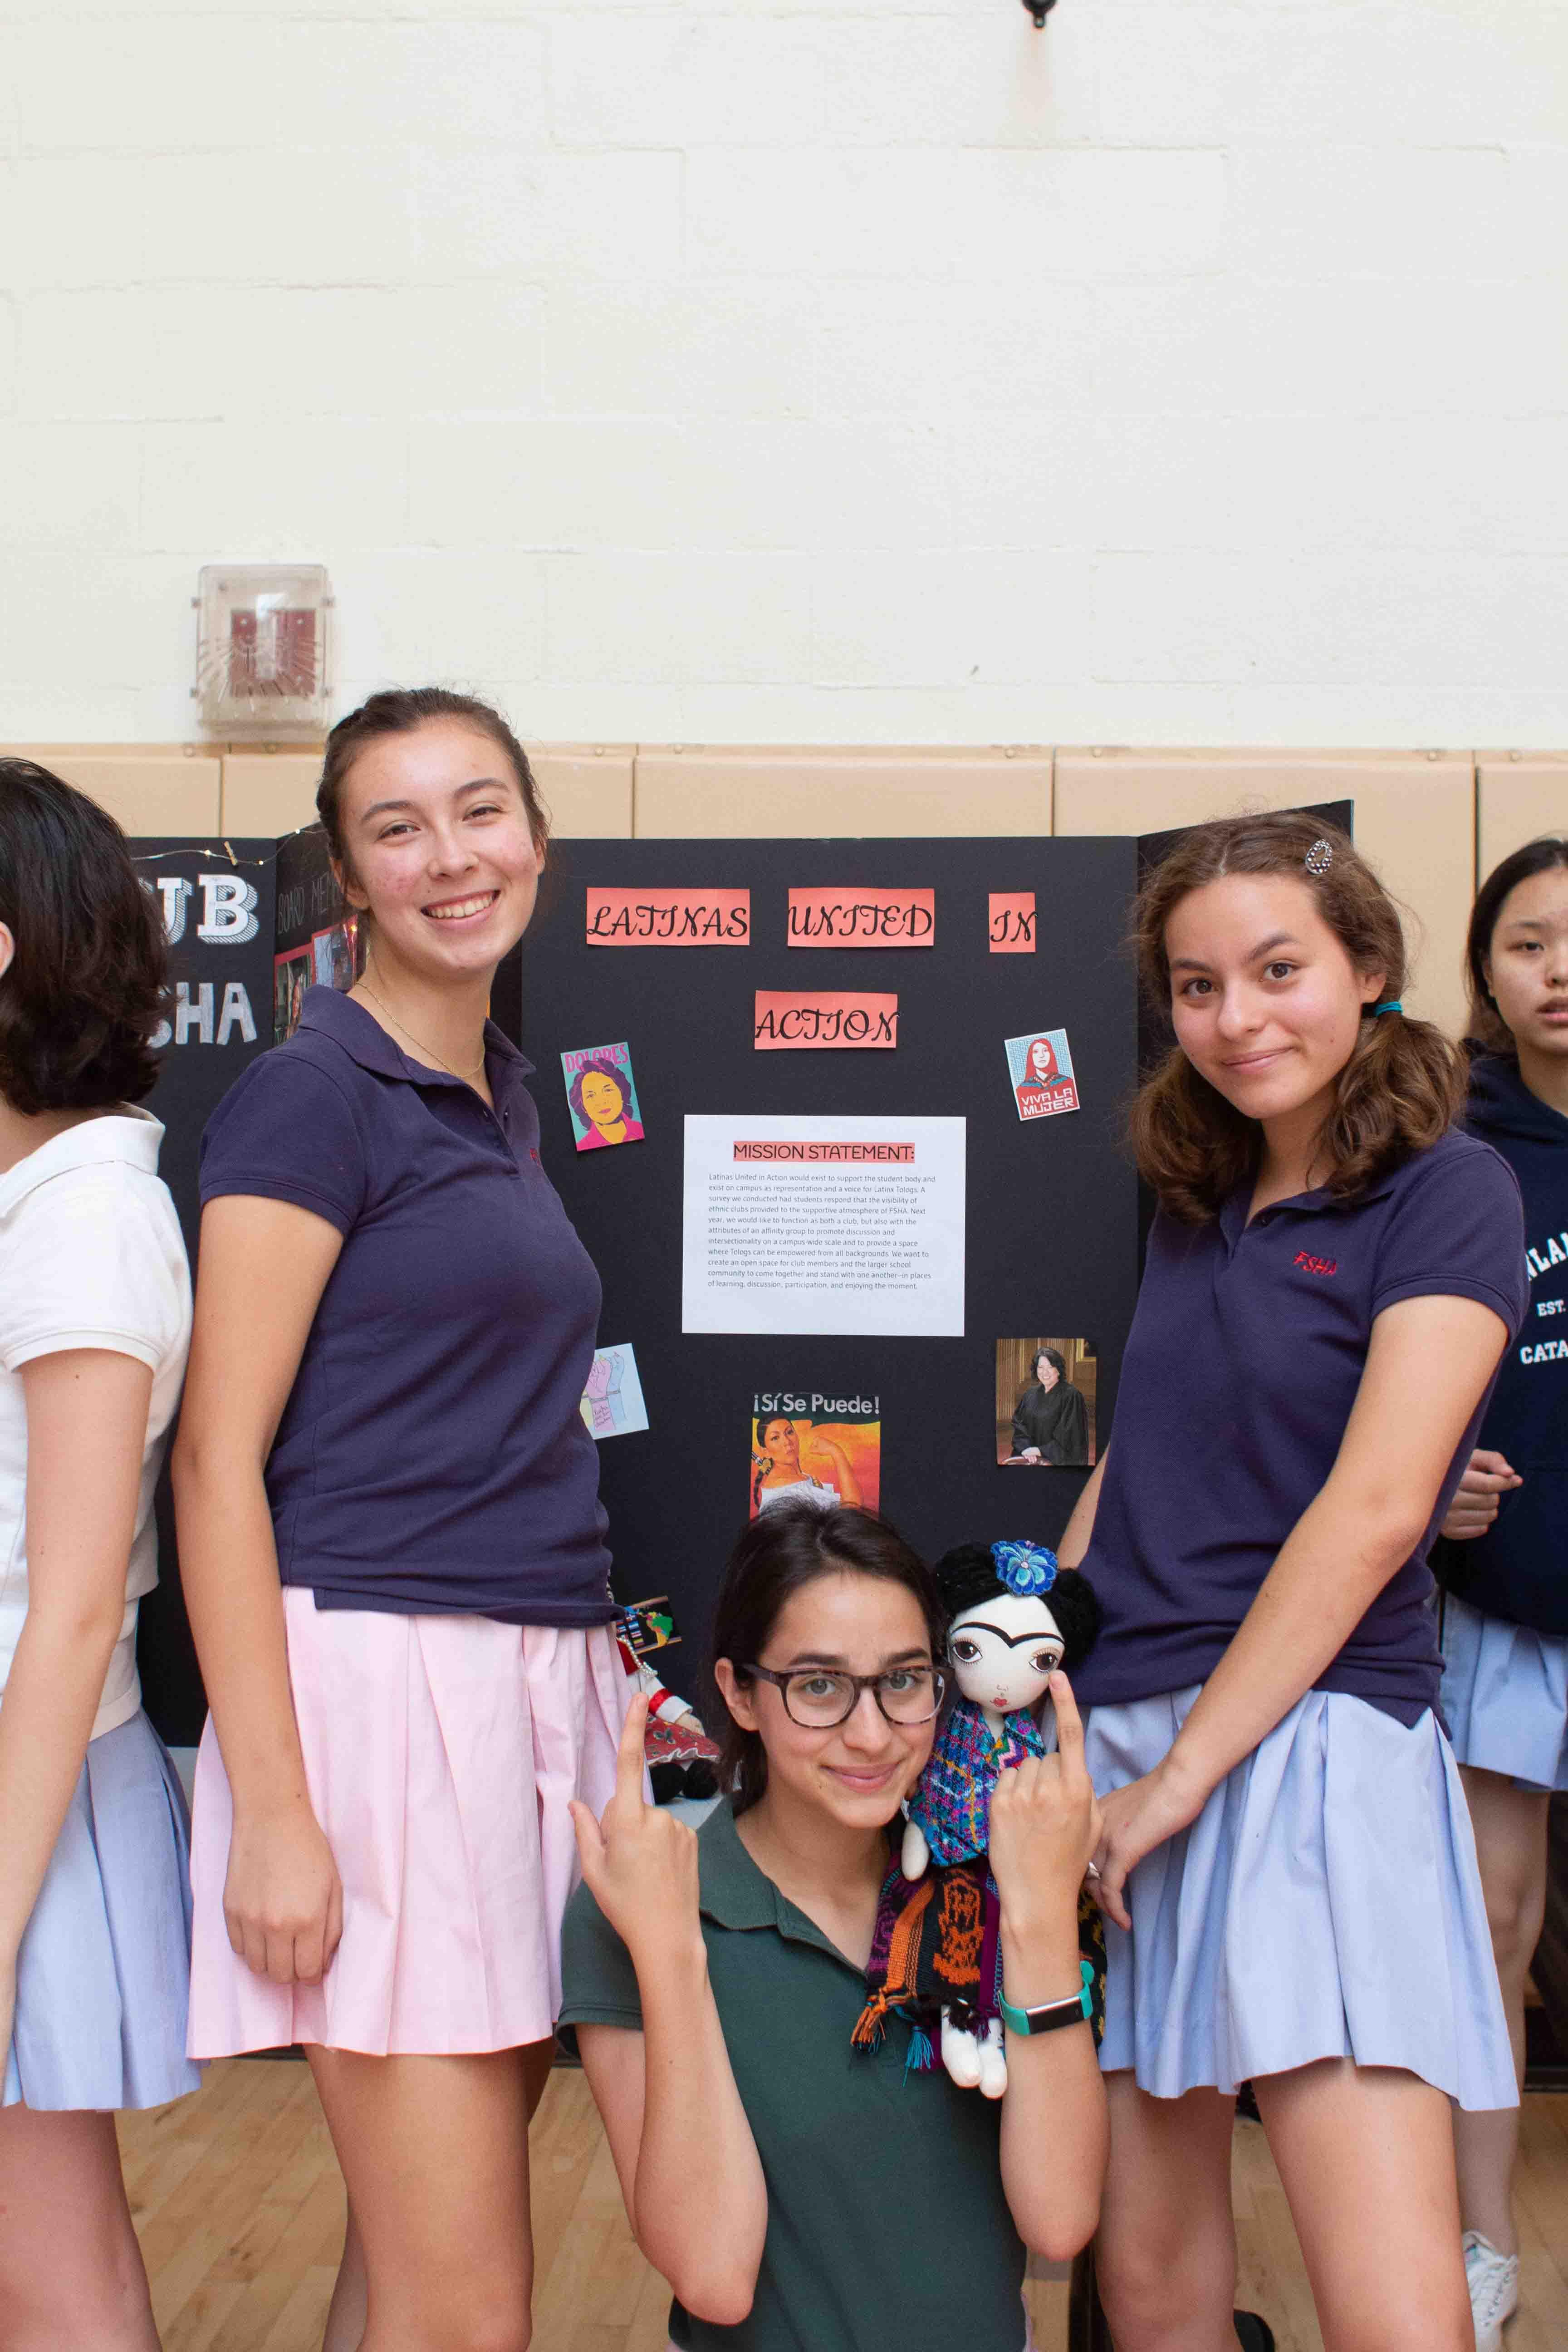 Latinas United in Action Club at FSHA